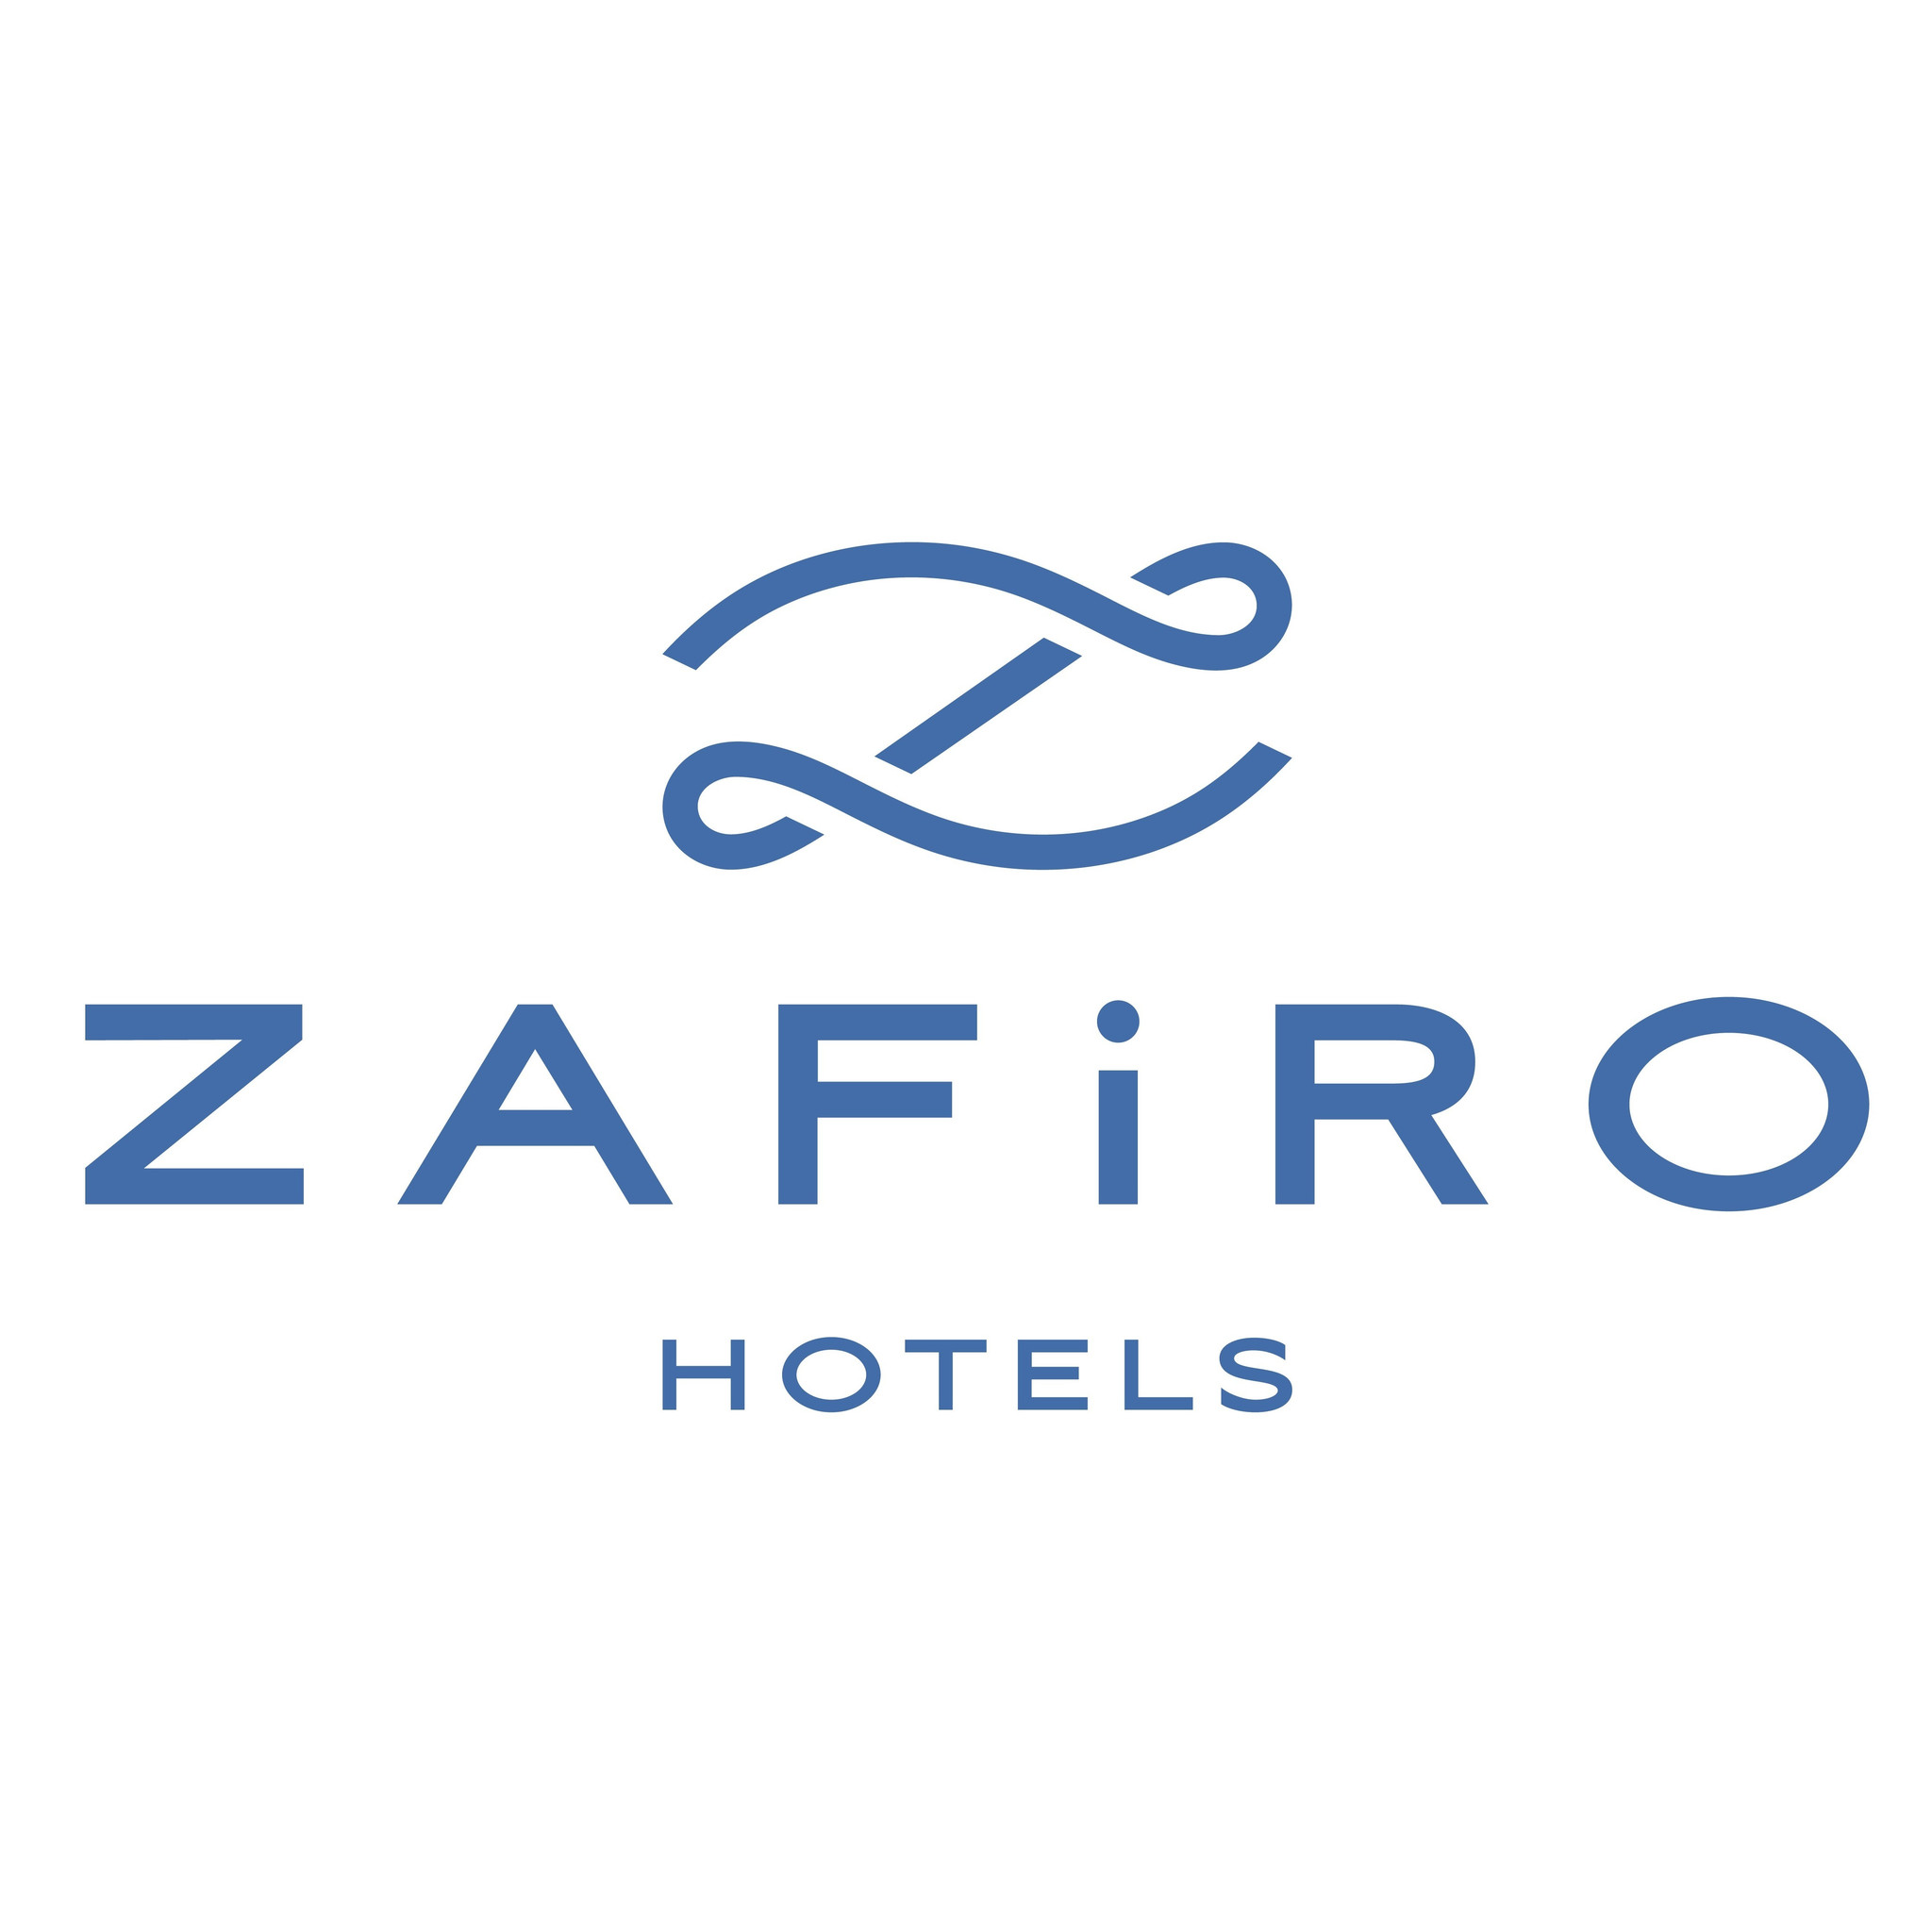 ZafiroHotels Coupon Code